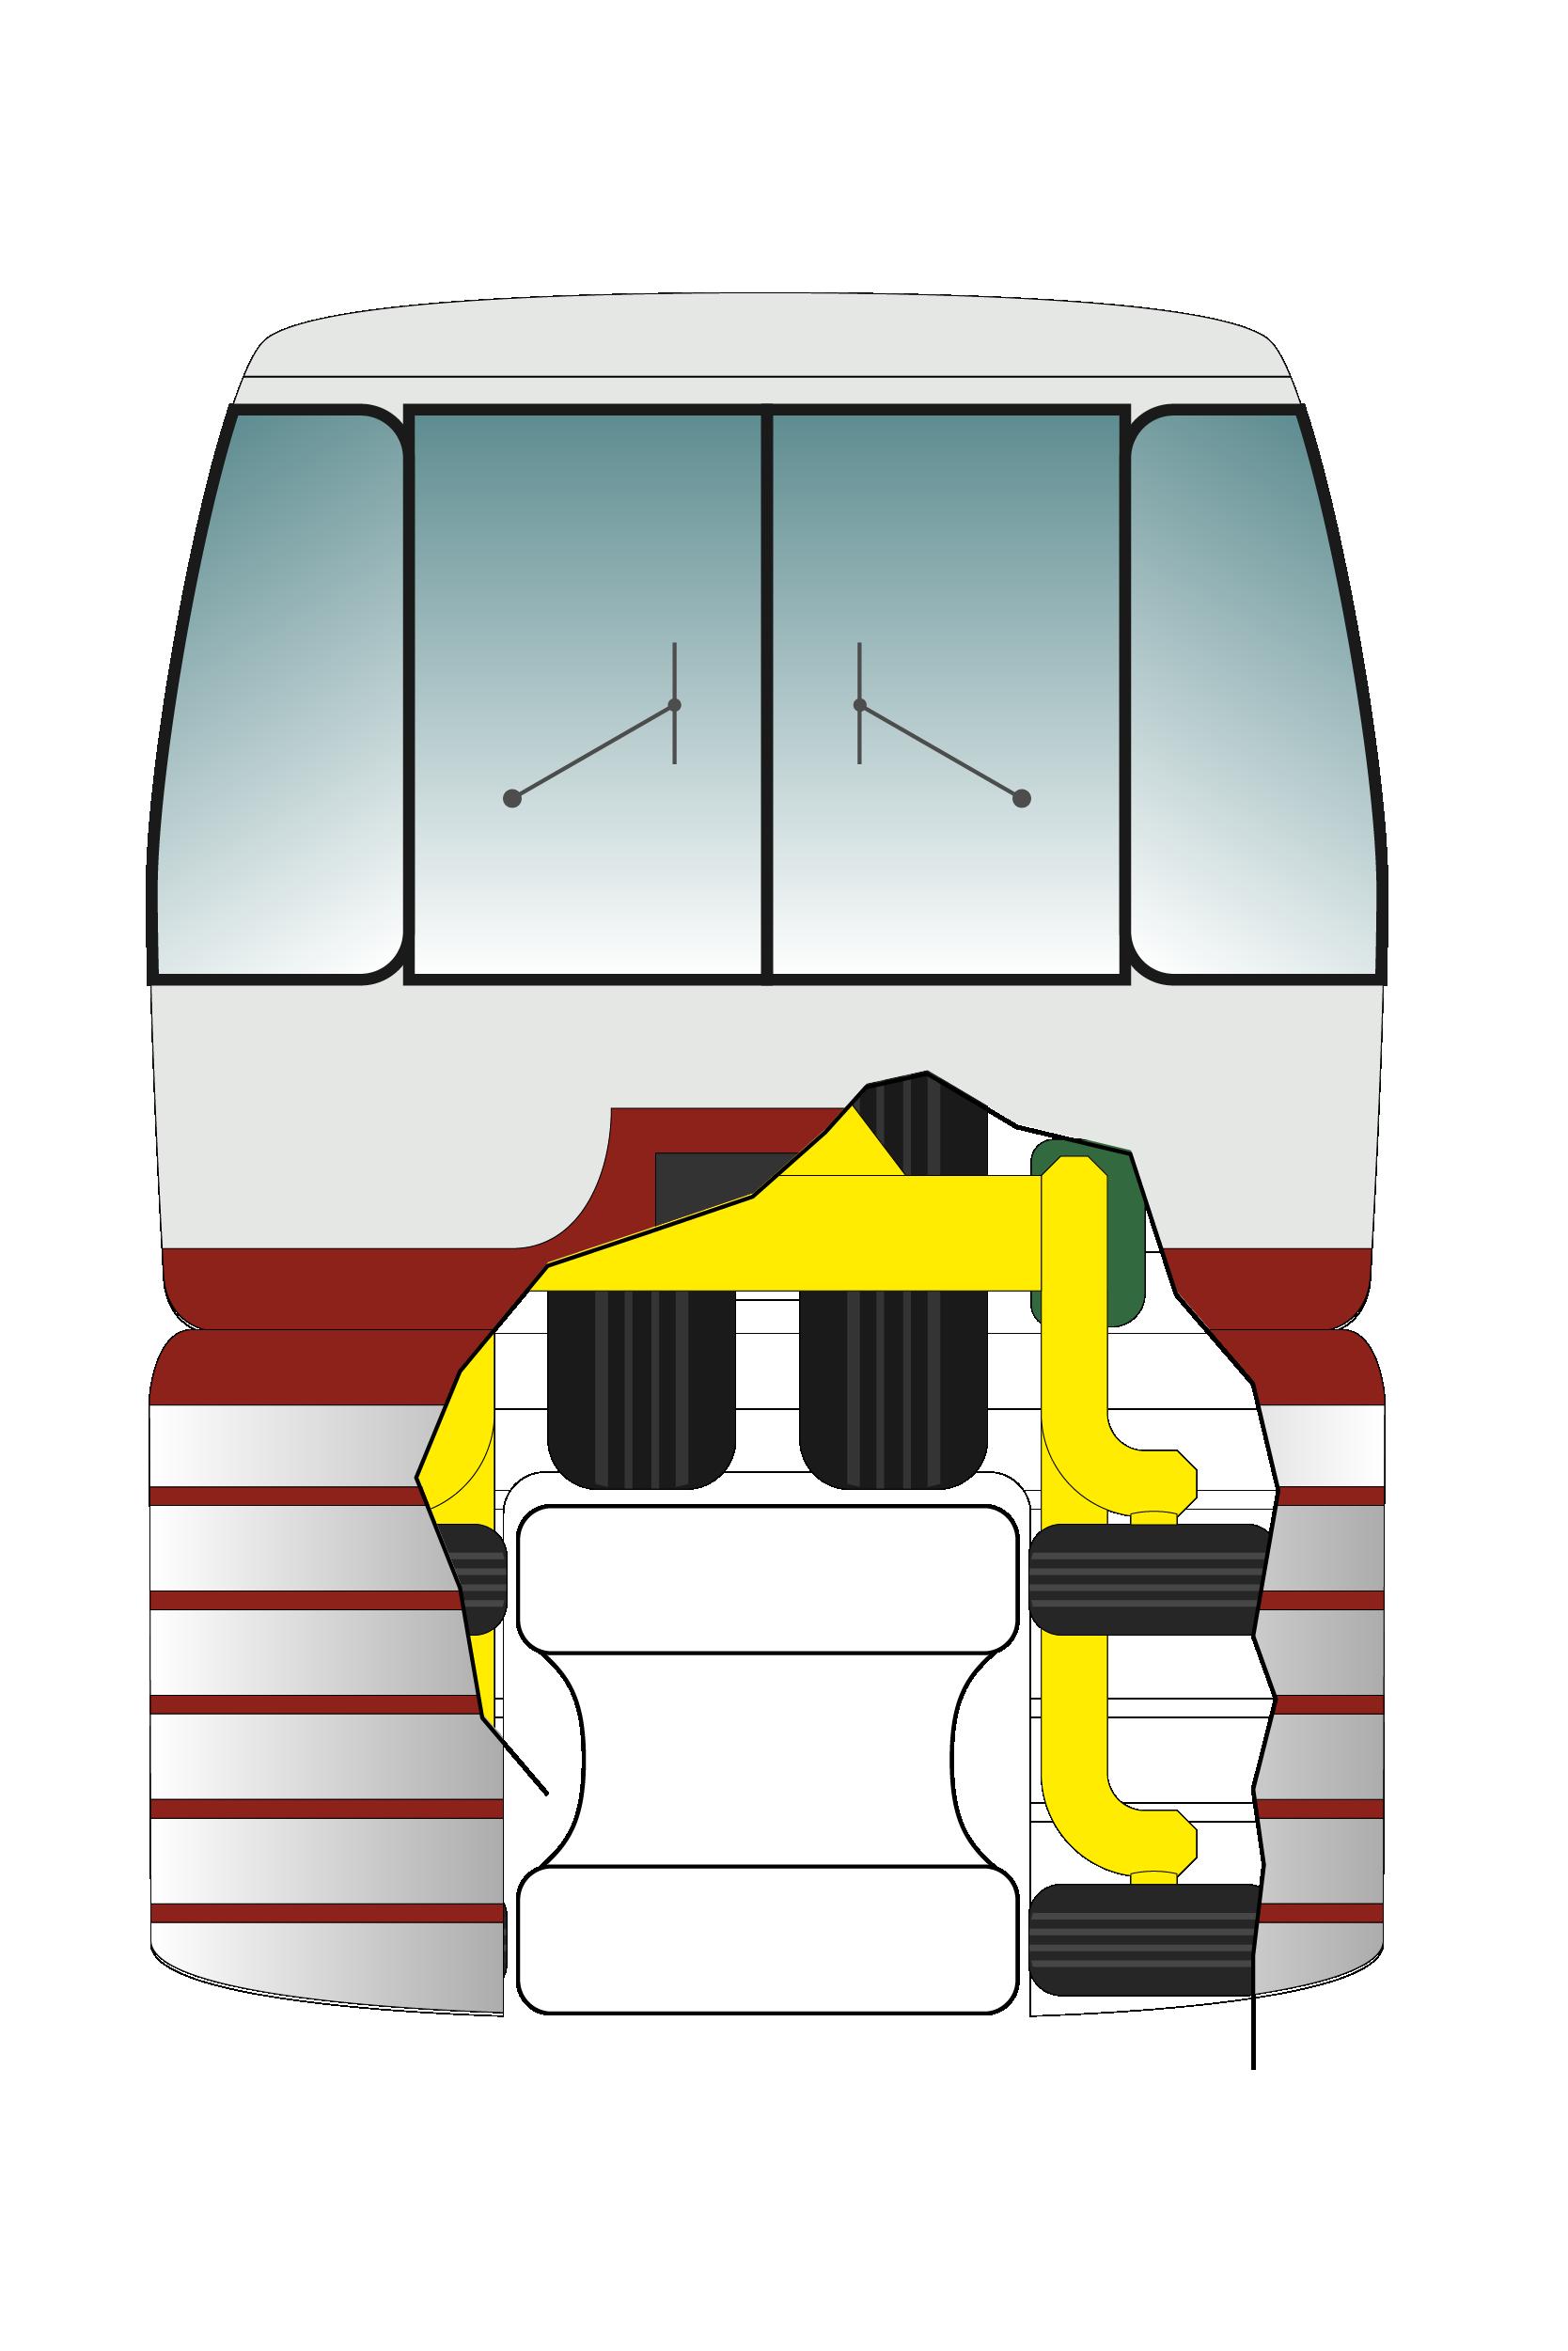 Illustration straddle monorail